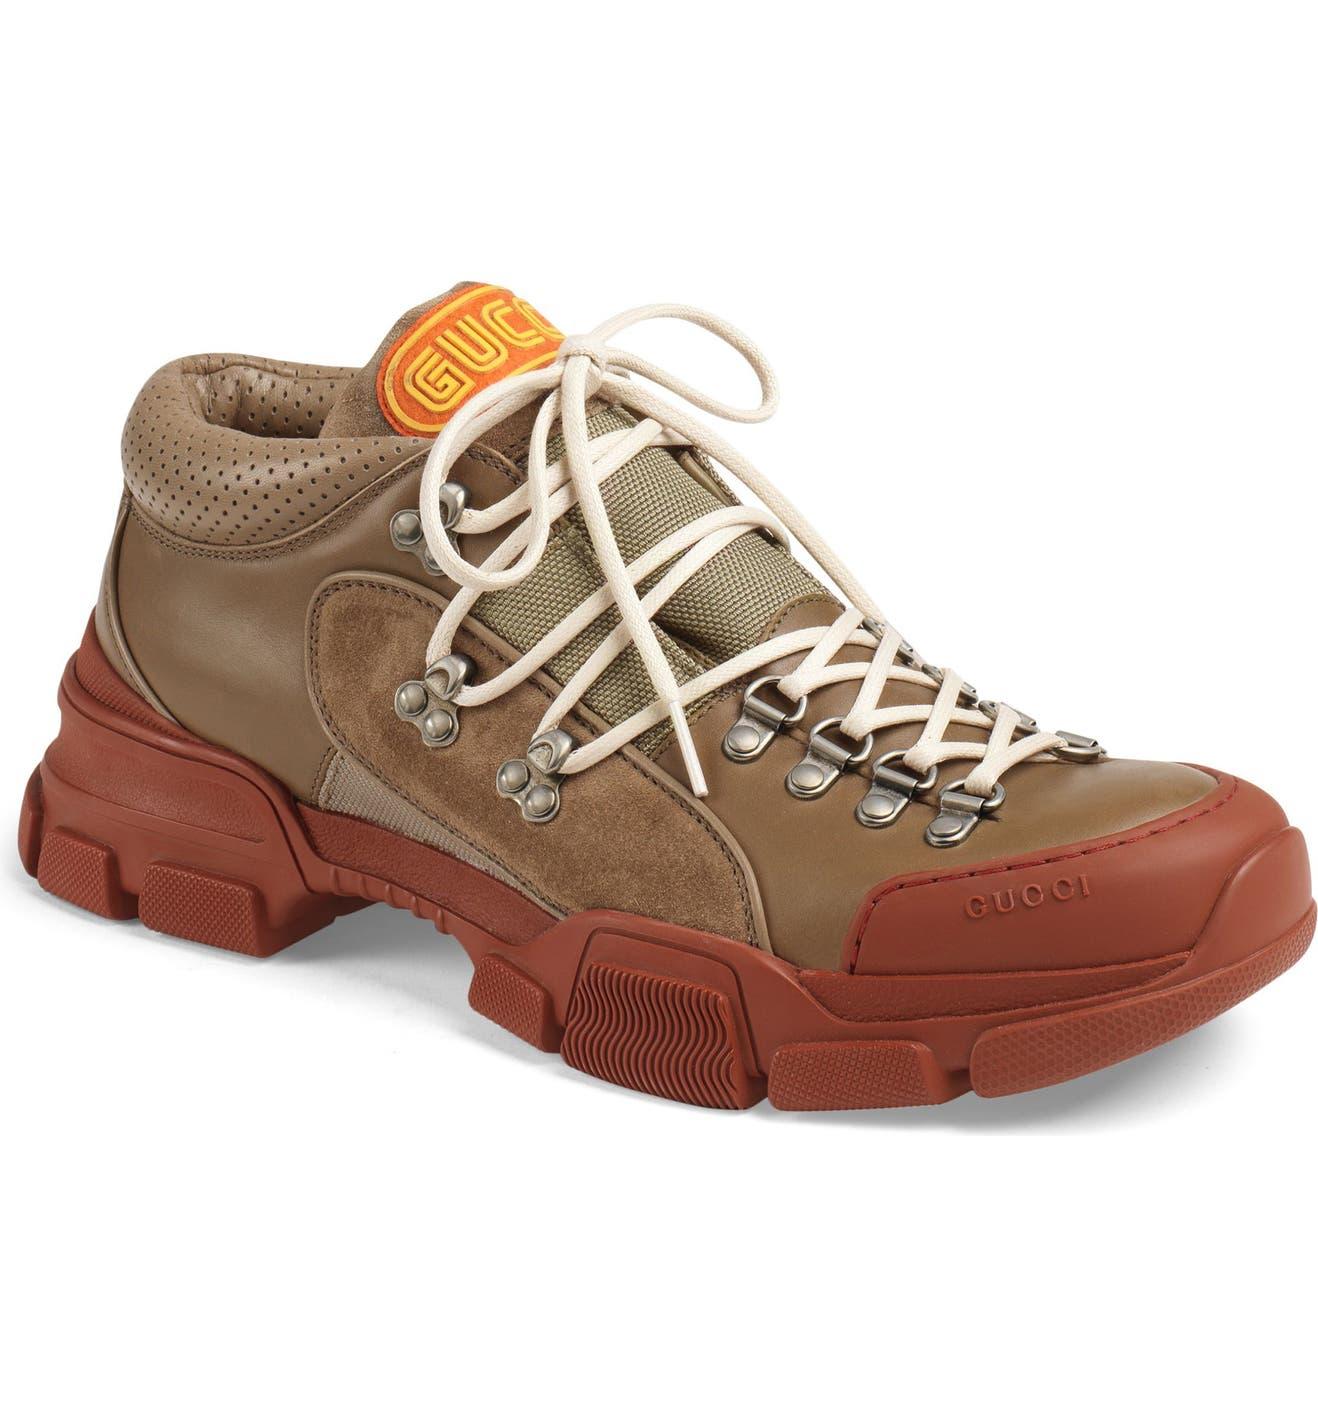 0066fa39c Gucci Leather & Original GG Trekking Boot (Men) | Nordstrom